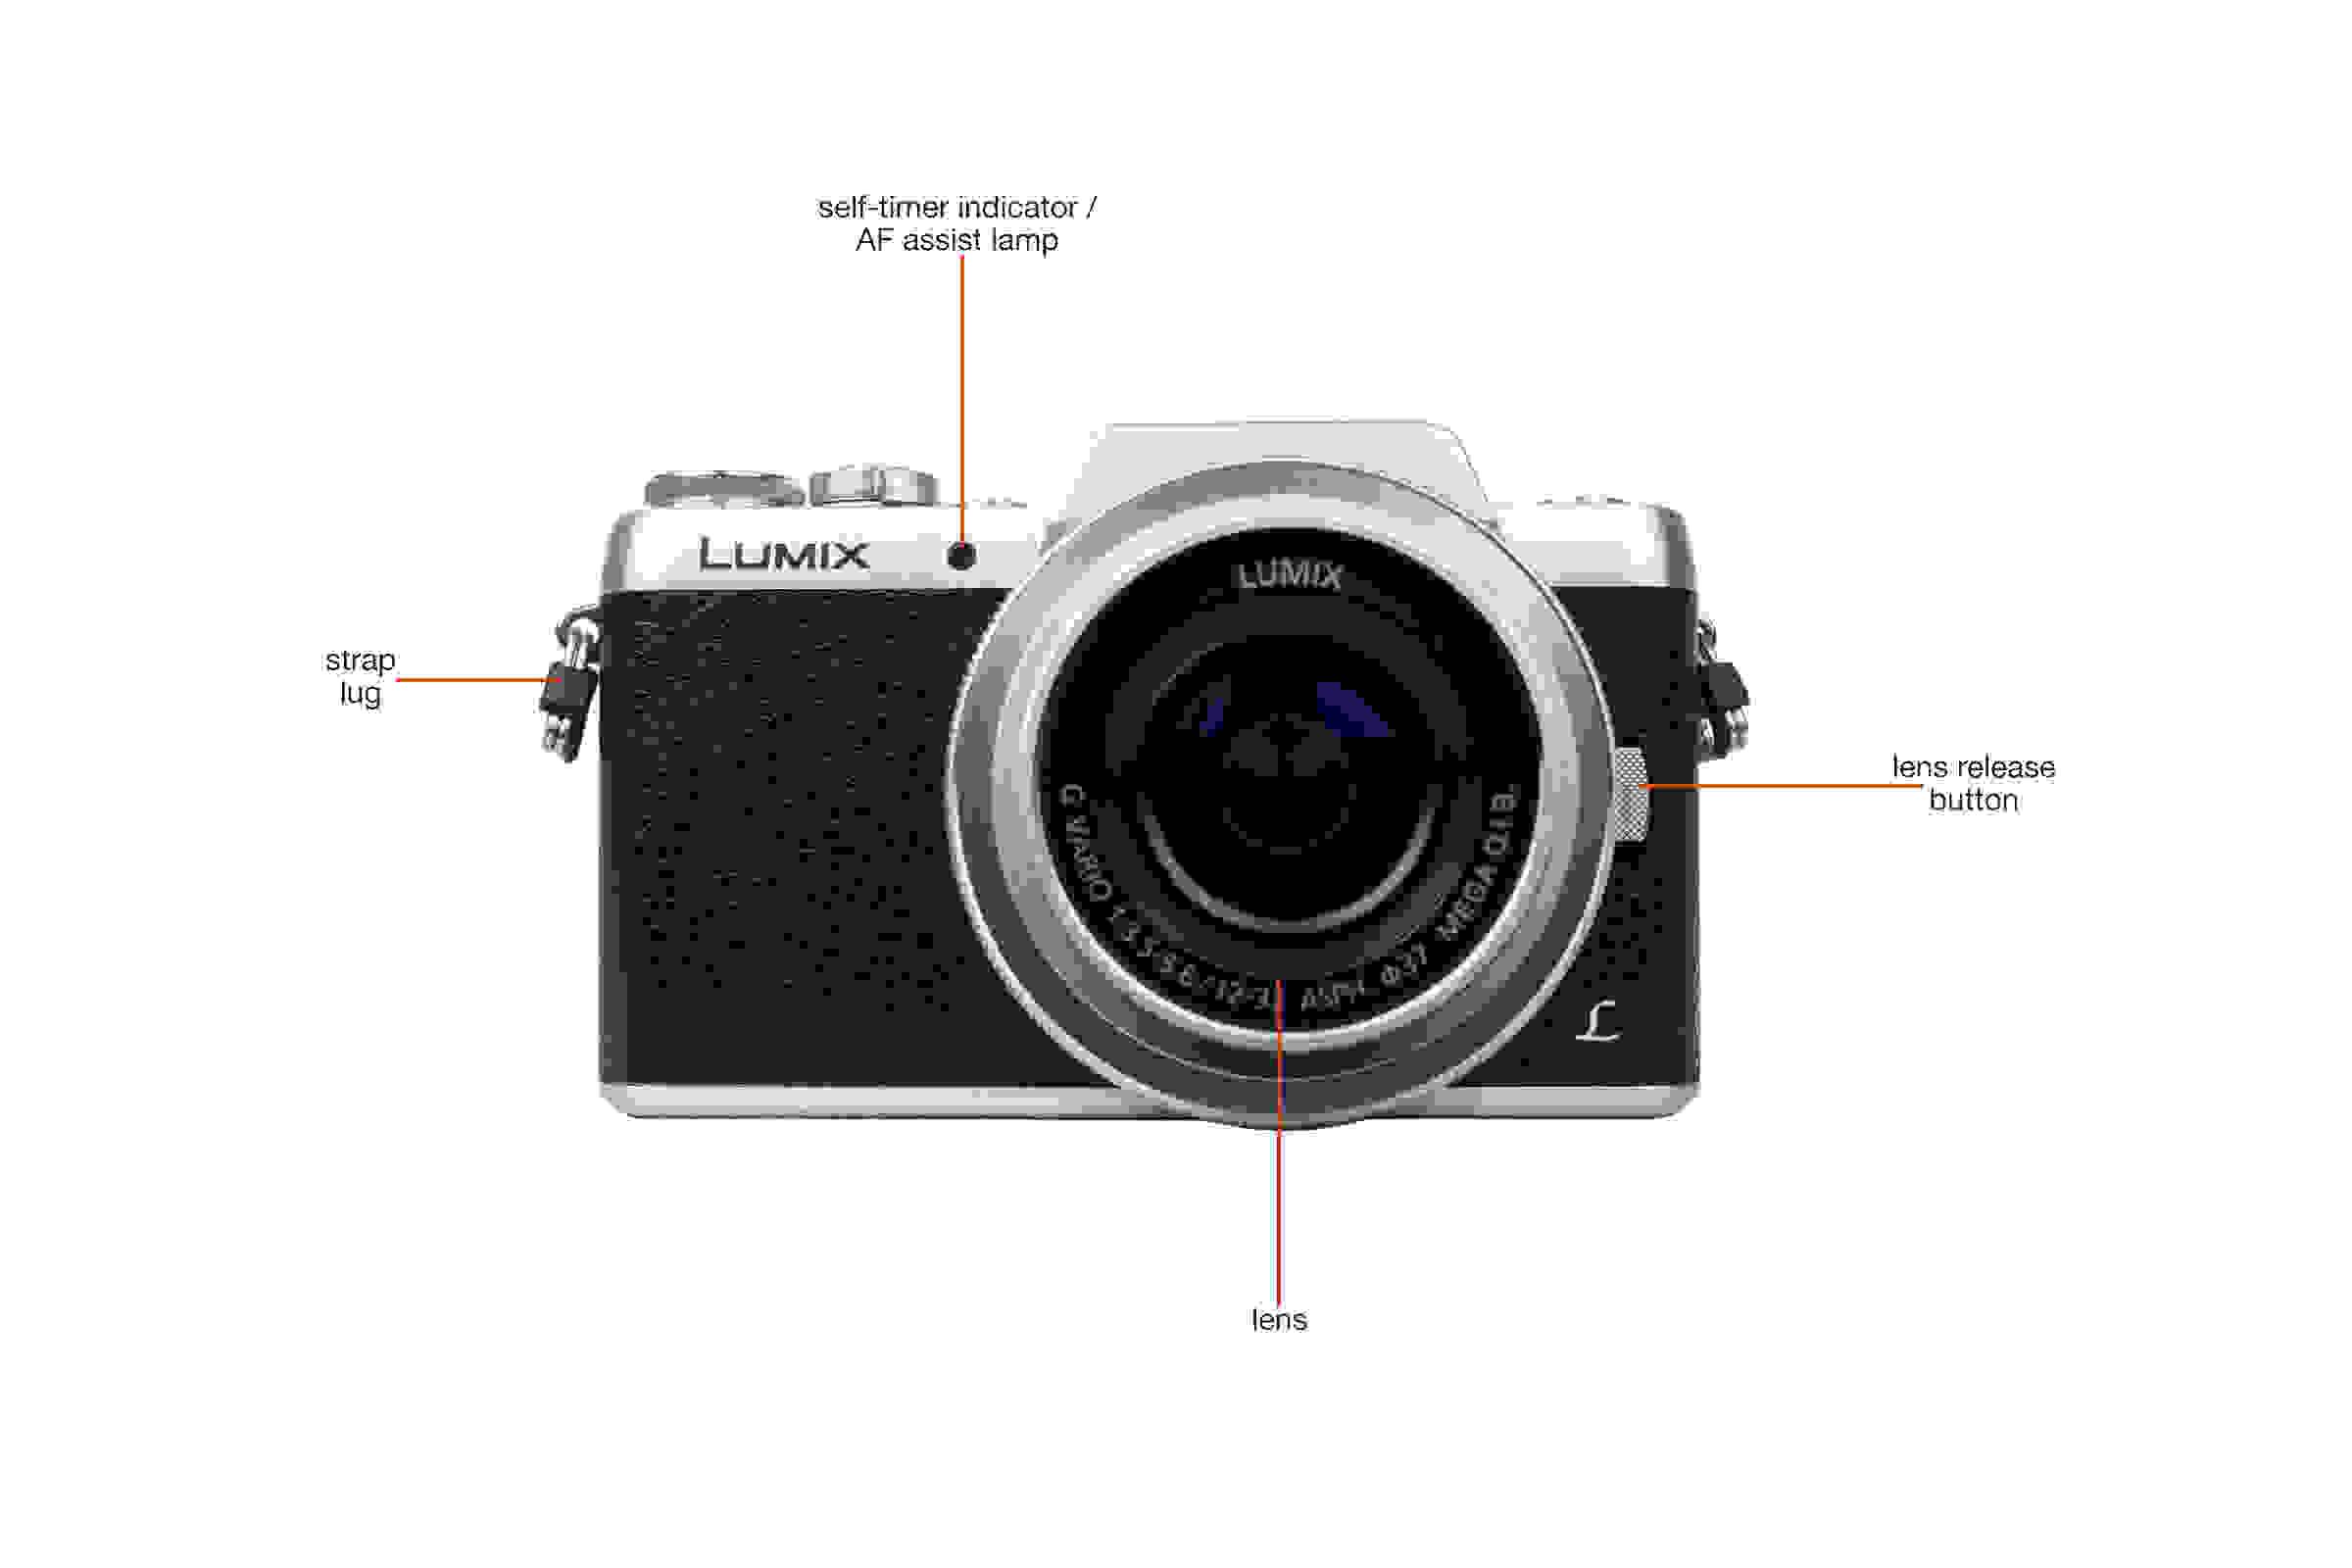 Front view of the Panasonic Lumix DMC GF7 .